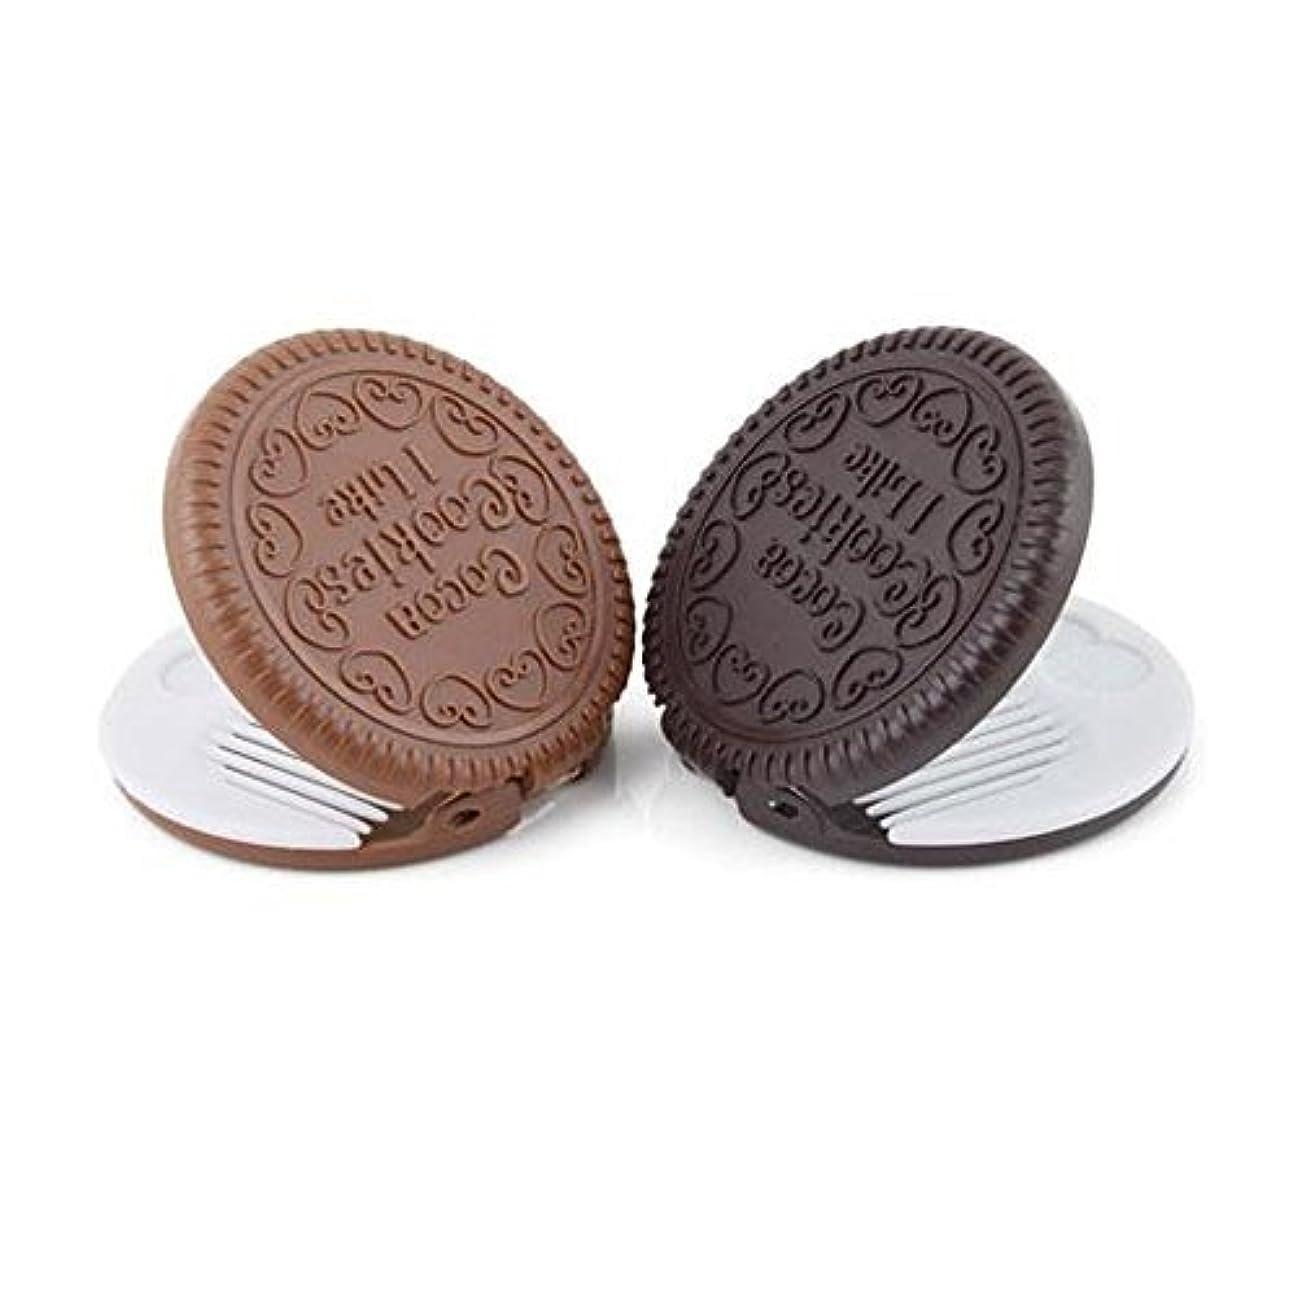 順番科学者yueton Pack of 2 Mini Pocket Chocolate Cookie Compact Mirror with Comb [並行輸入品]